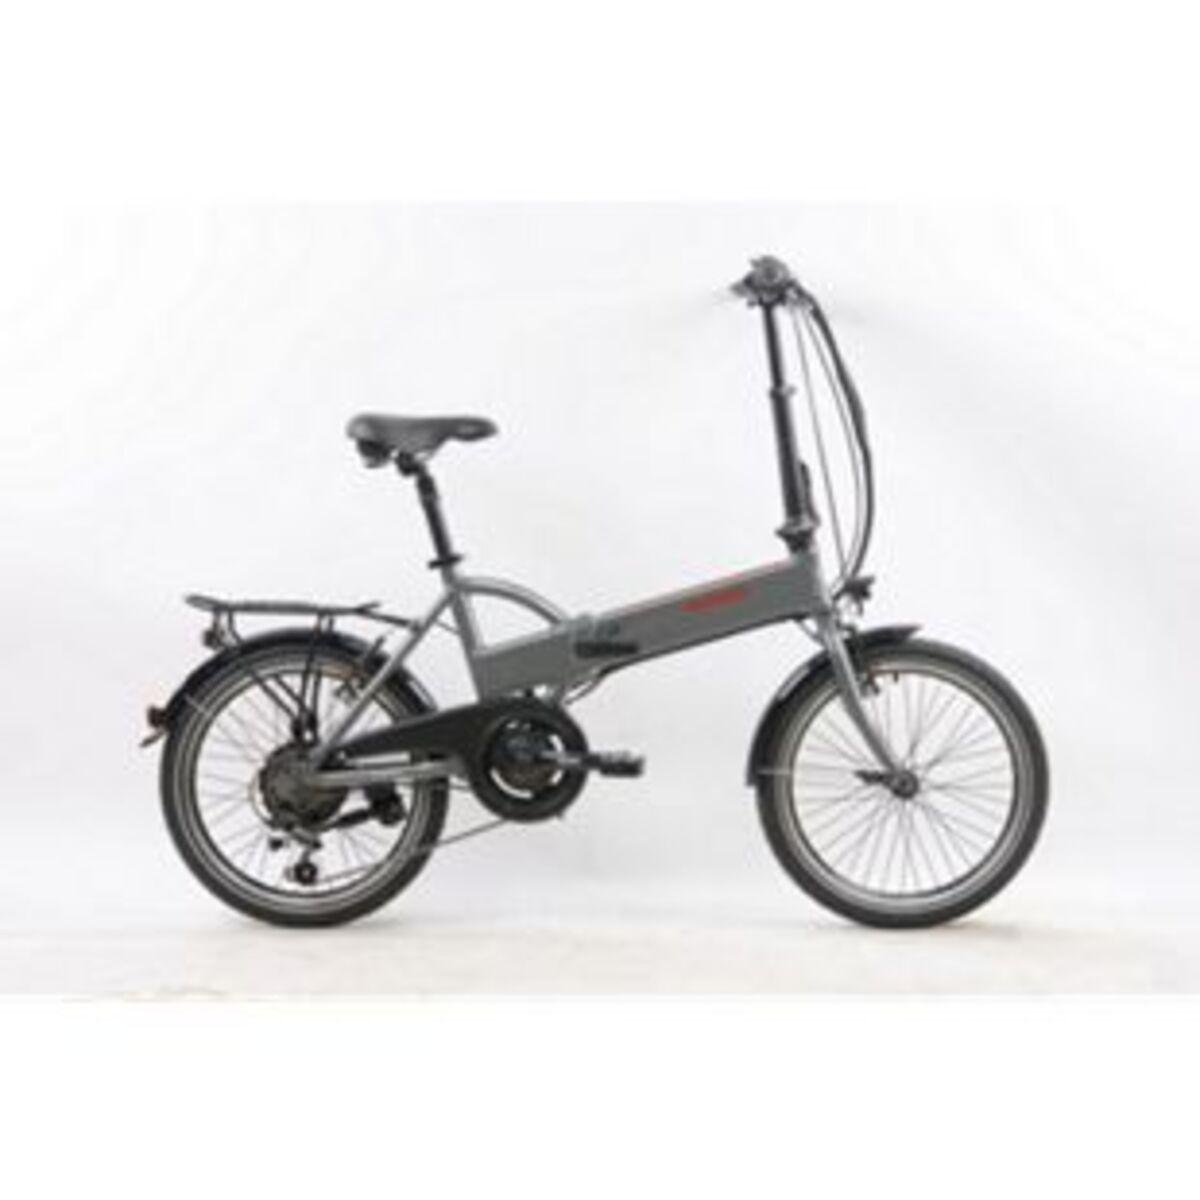 "Bild 2 von Telefunken 20"" Alu Falt E-Bike kompakt F820"